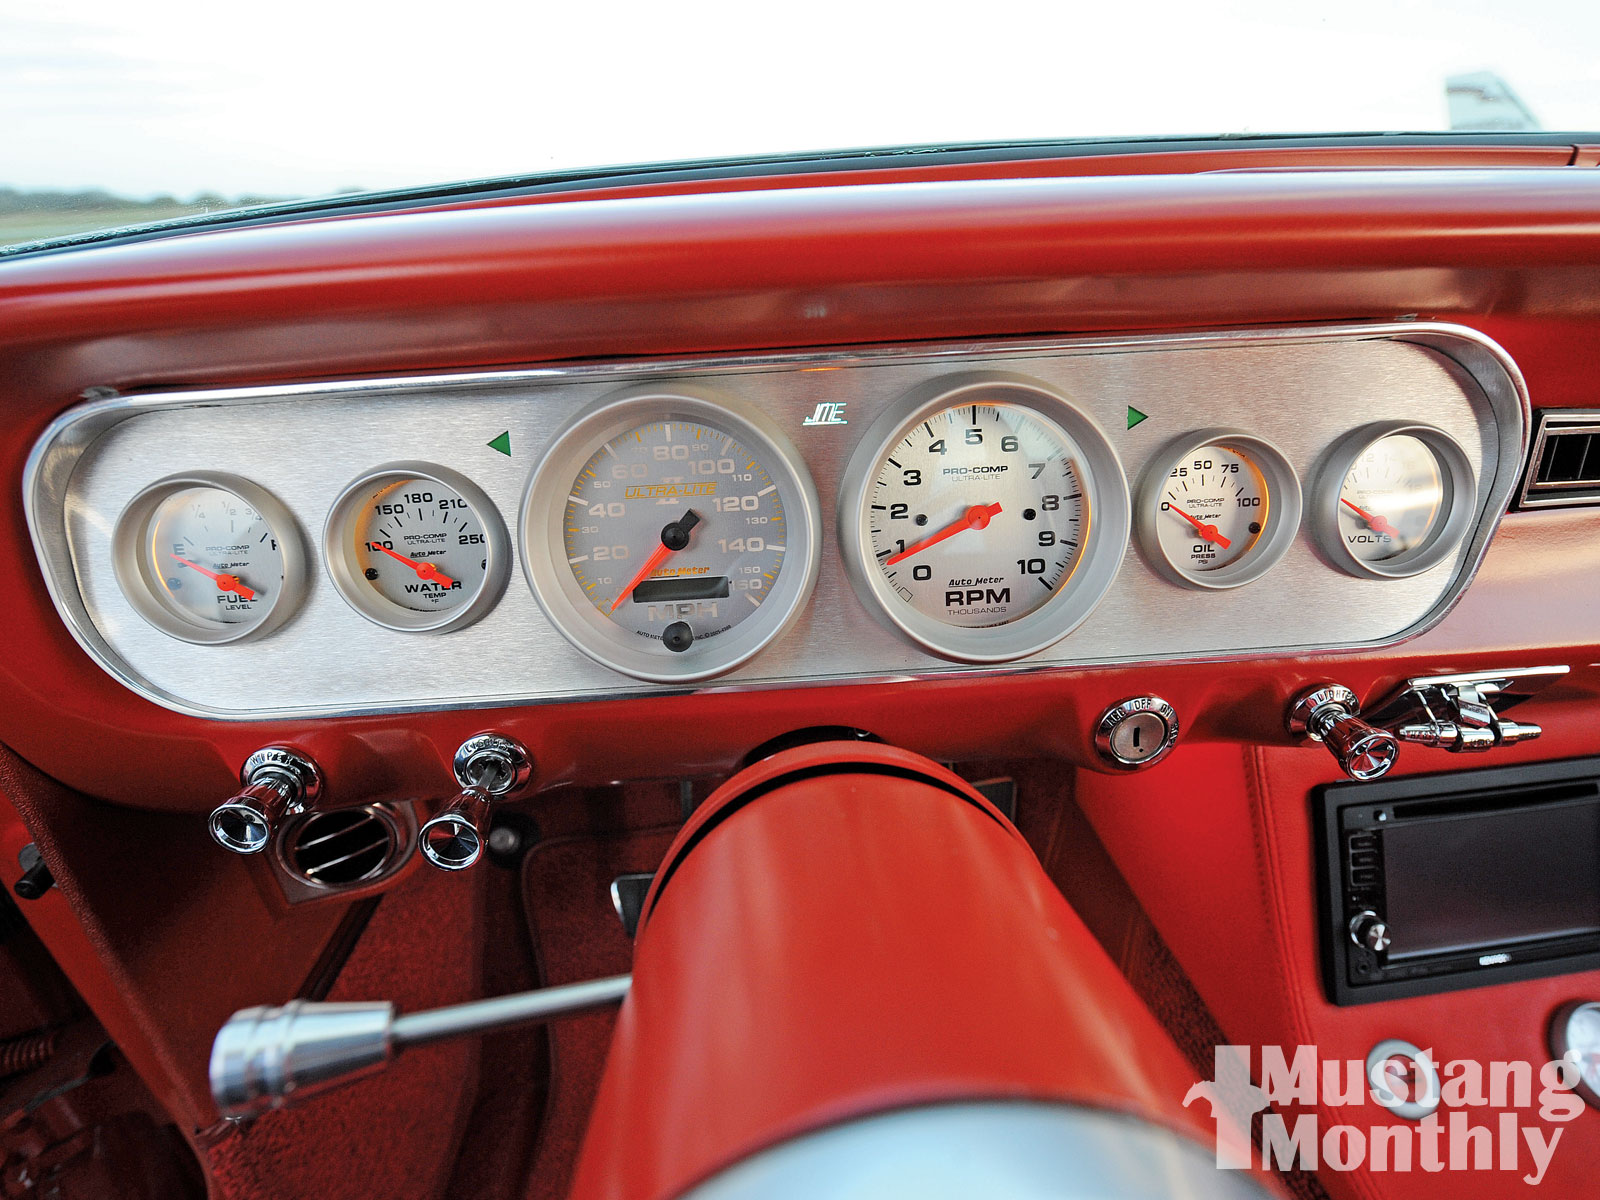 Mump 1006 11 O 1965 Ford Mustang Fastback Dashboard